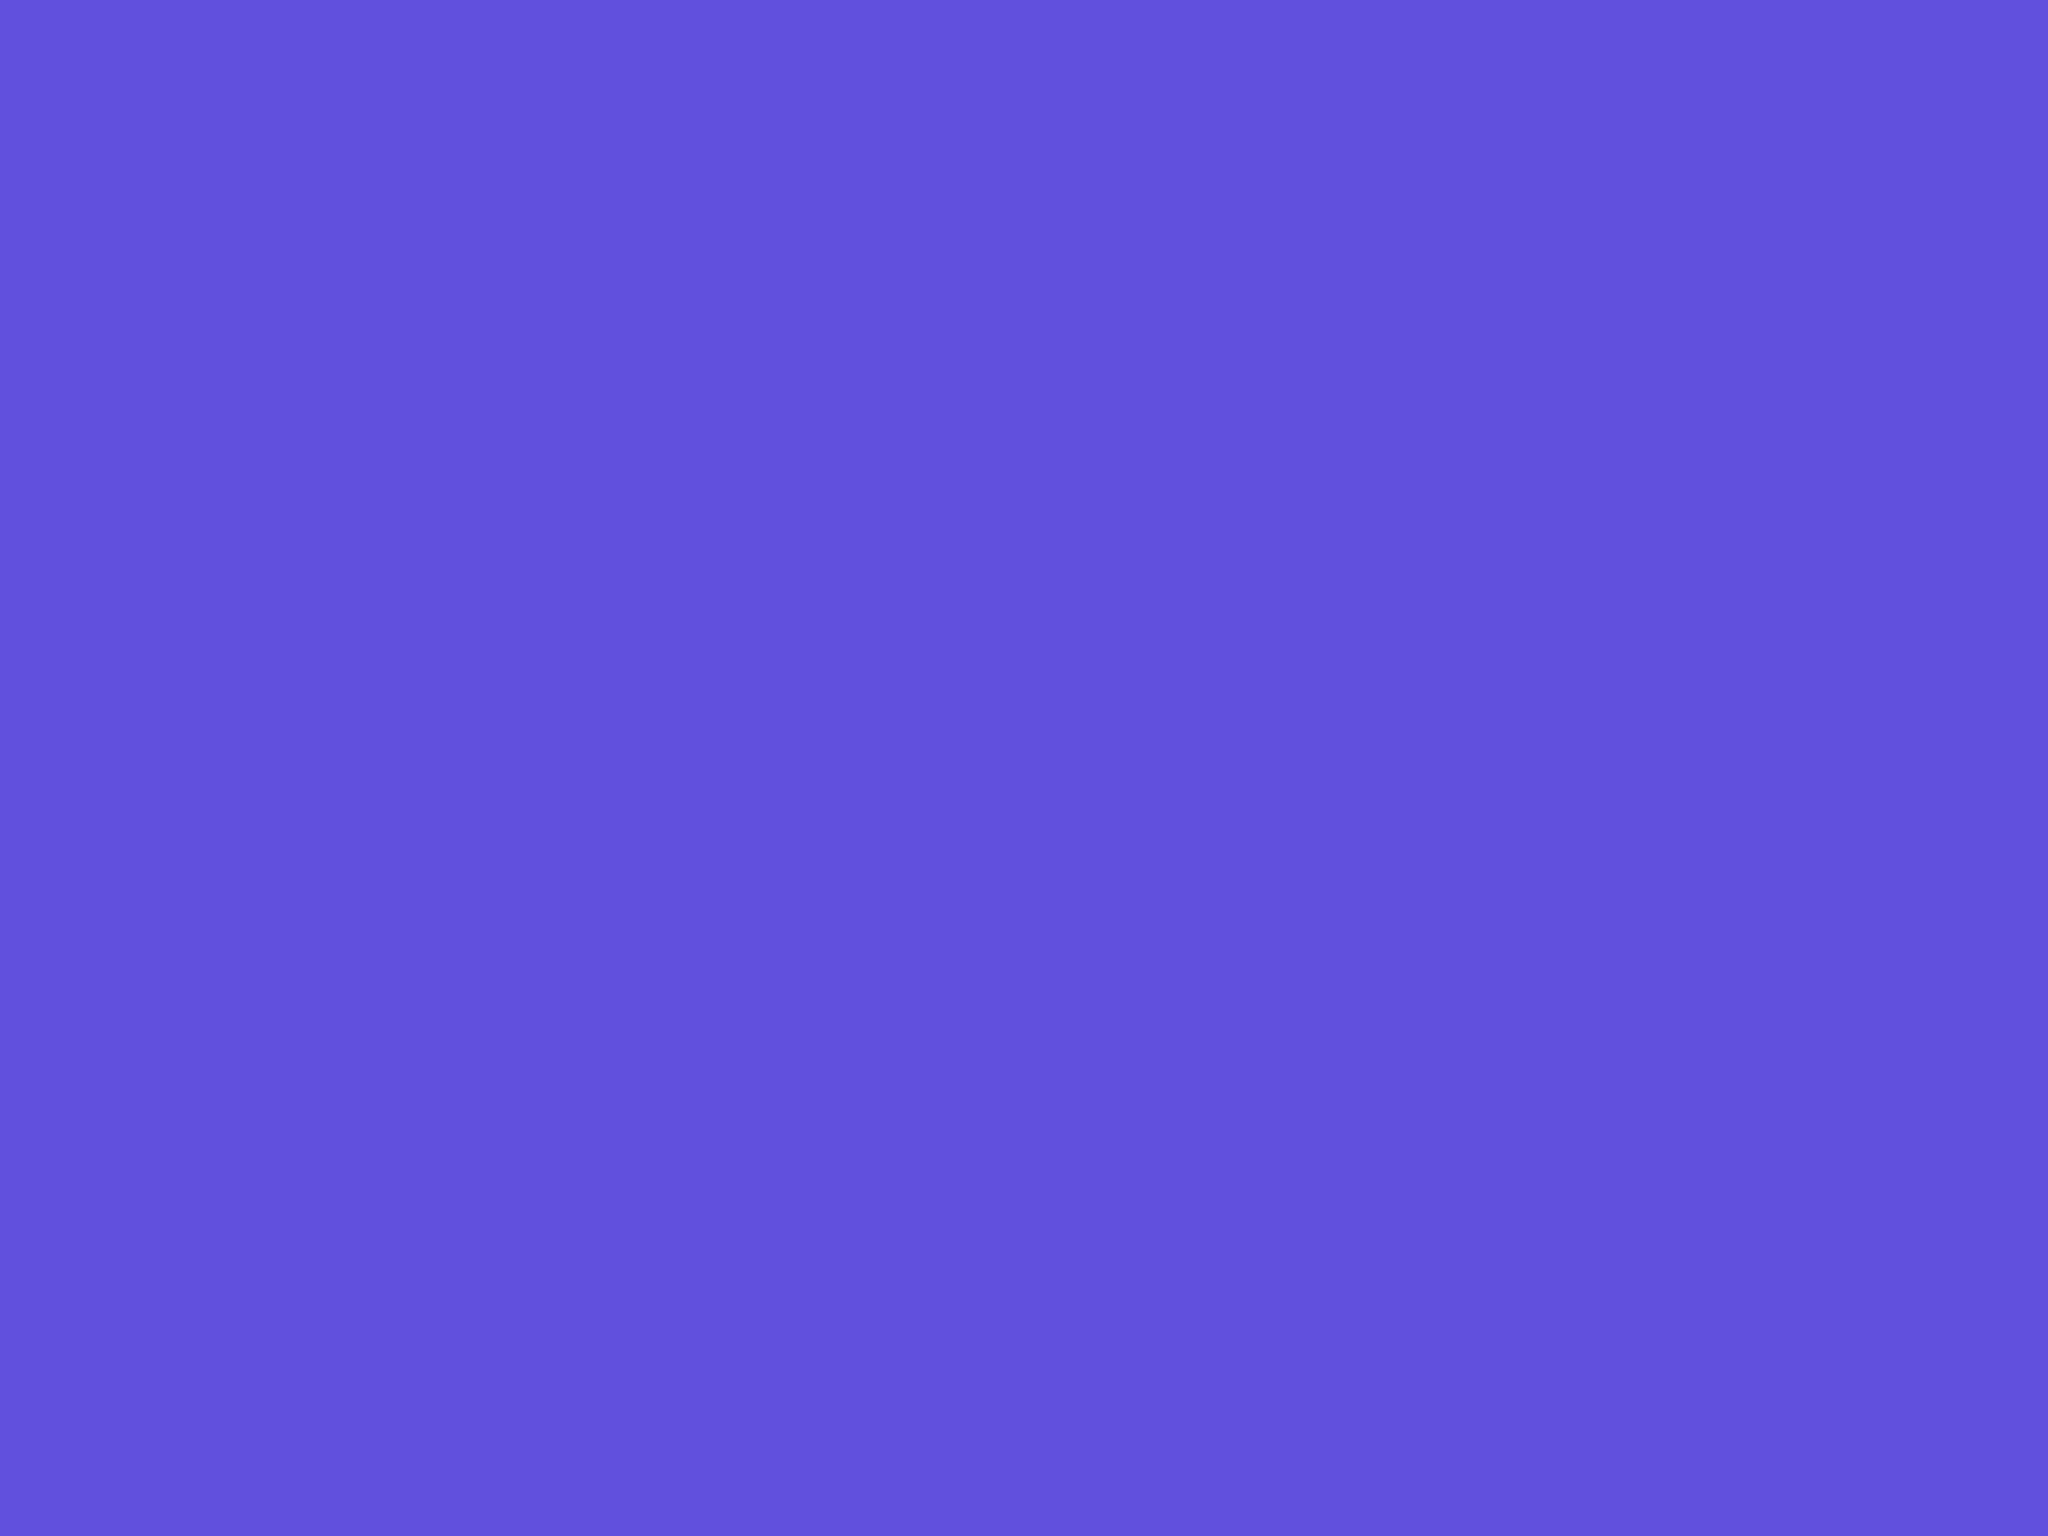 2048x1536 Majorelle Blue Solid Color Background